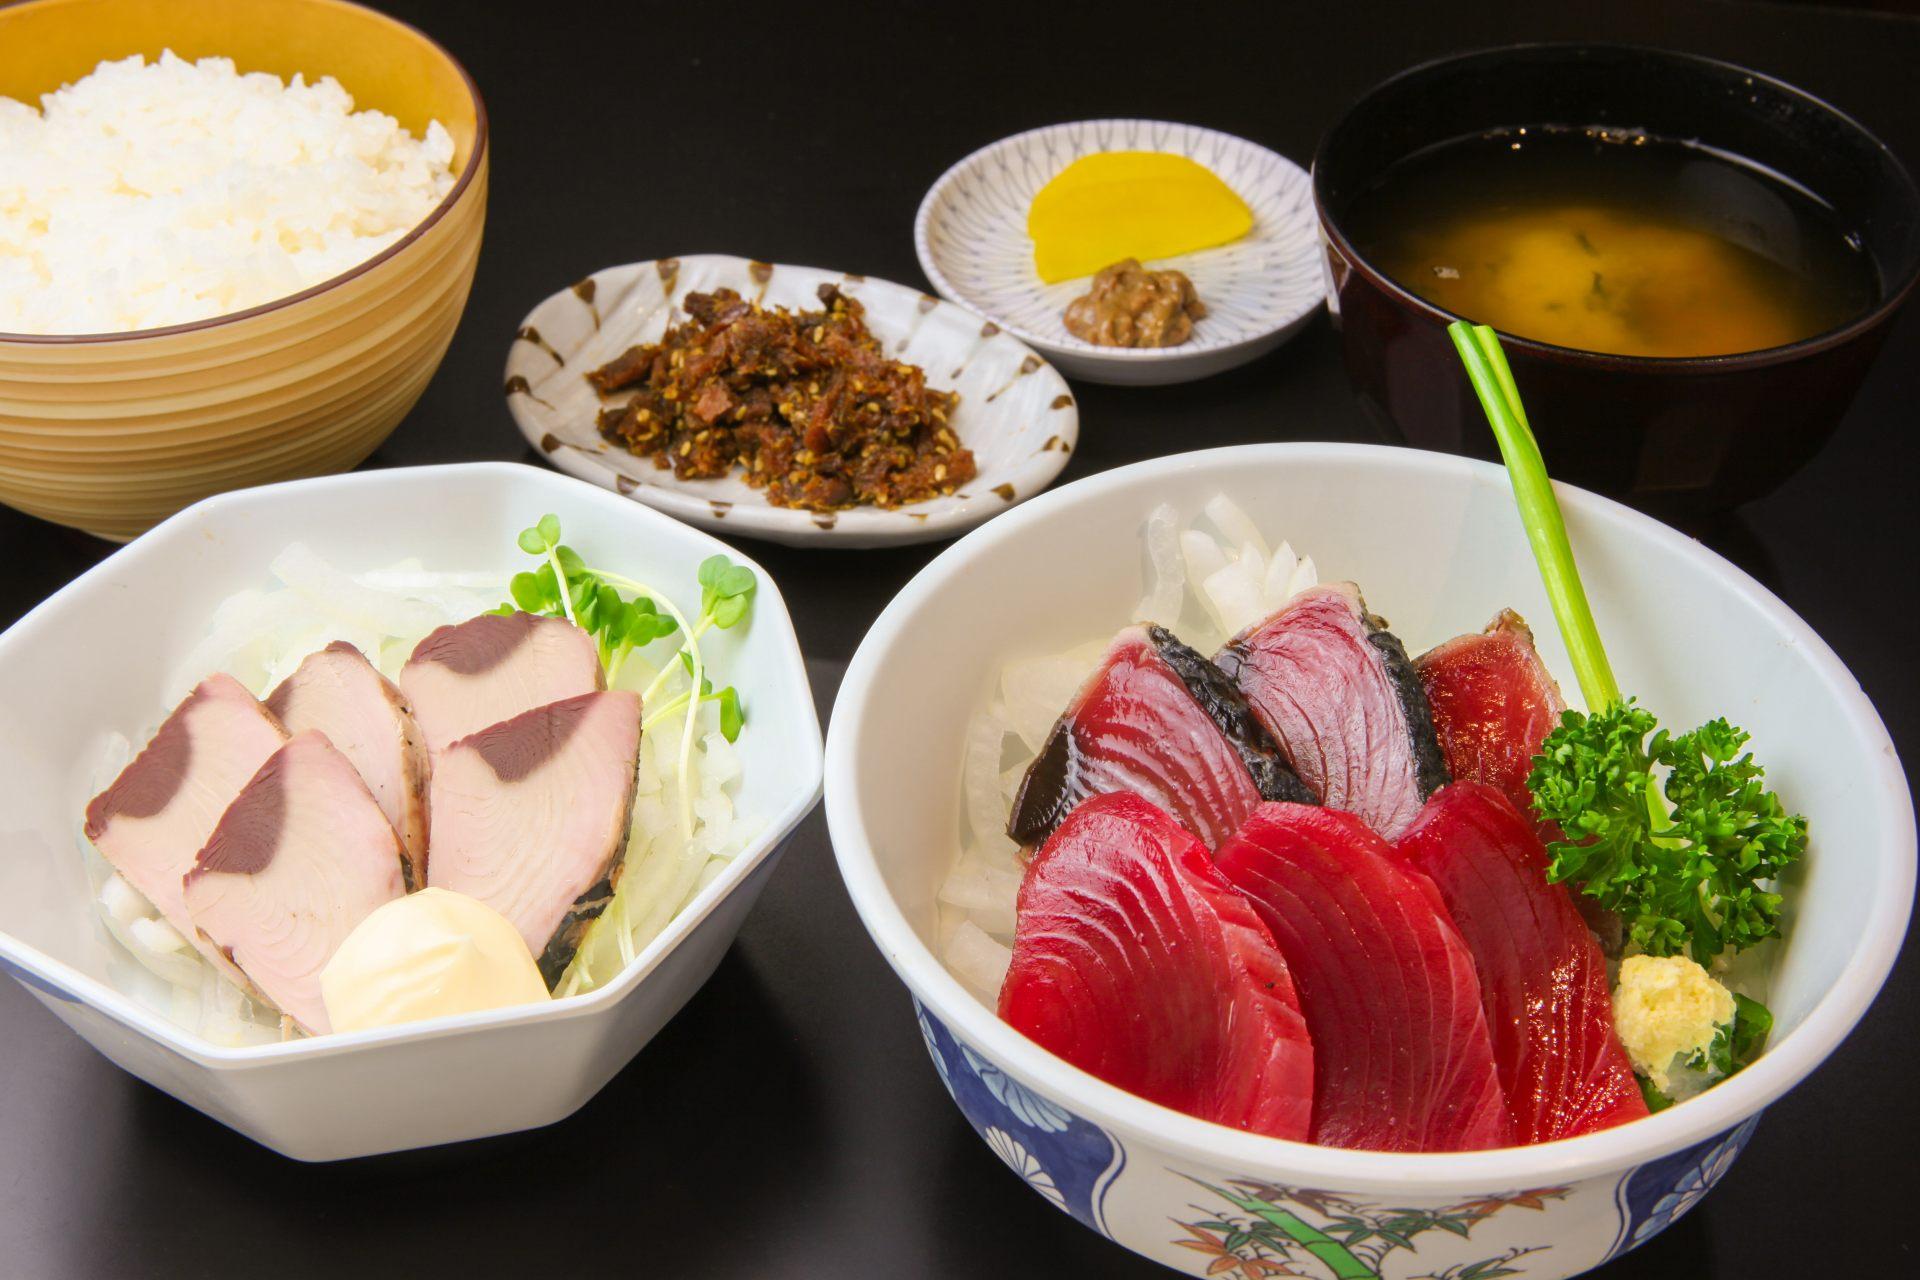 Enjoy delicious fresh seafood!